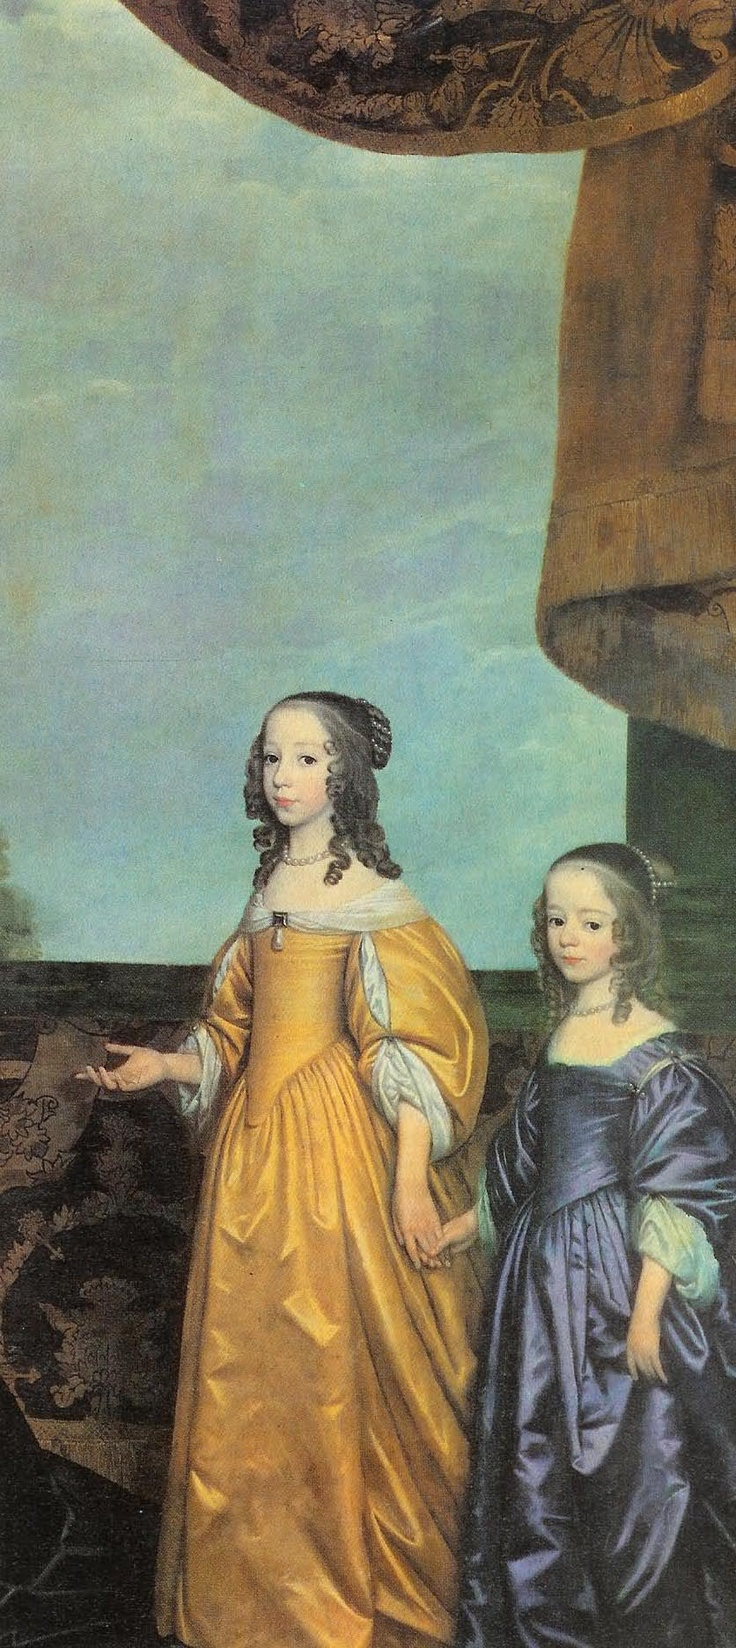 Louise-Henriette of Orange-Nassau and her sister Henriette-Catharina